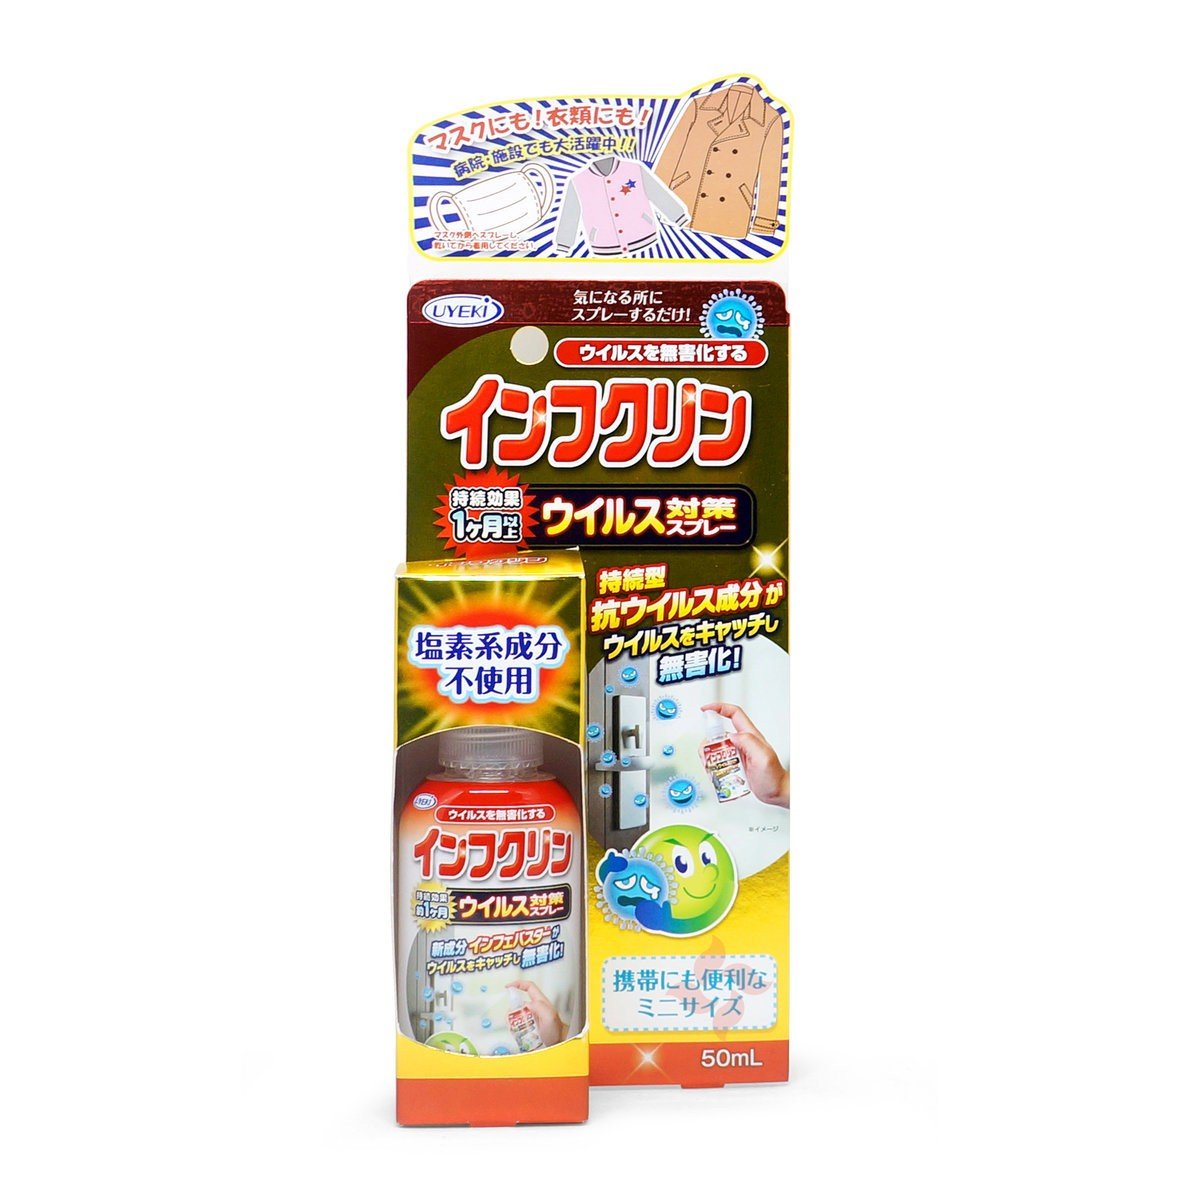 Yamibuy.com:Customer reviews:【New】Japan UYEKI InfClin  Anti-flu Spray 50ml